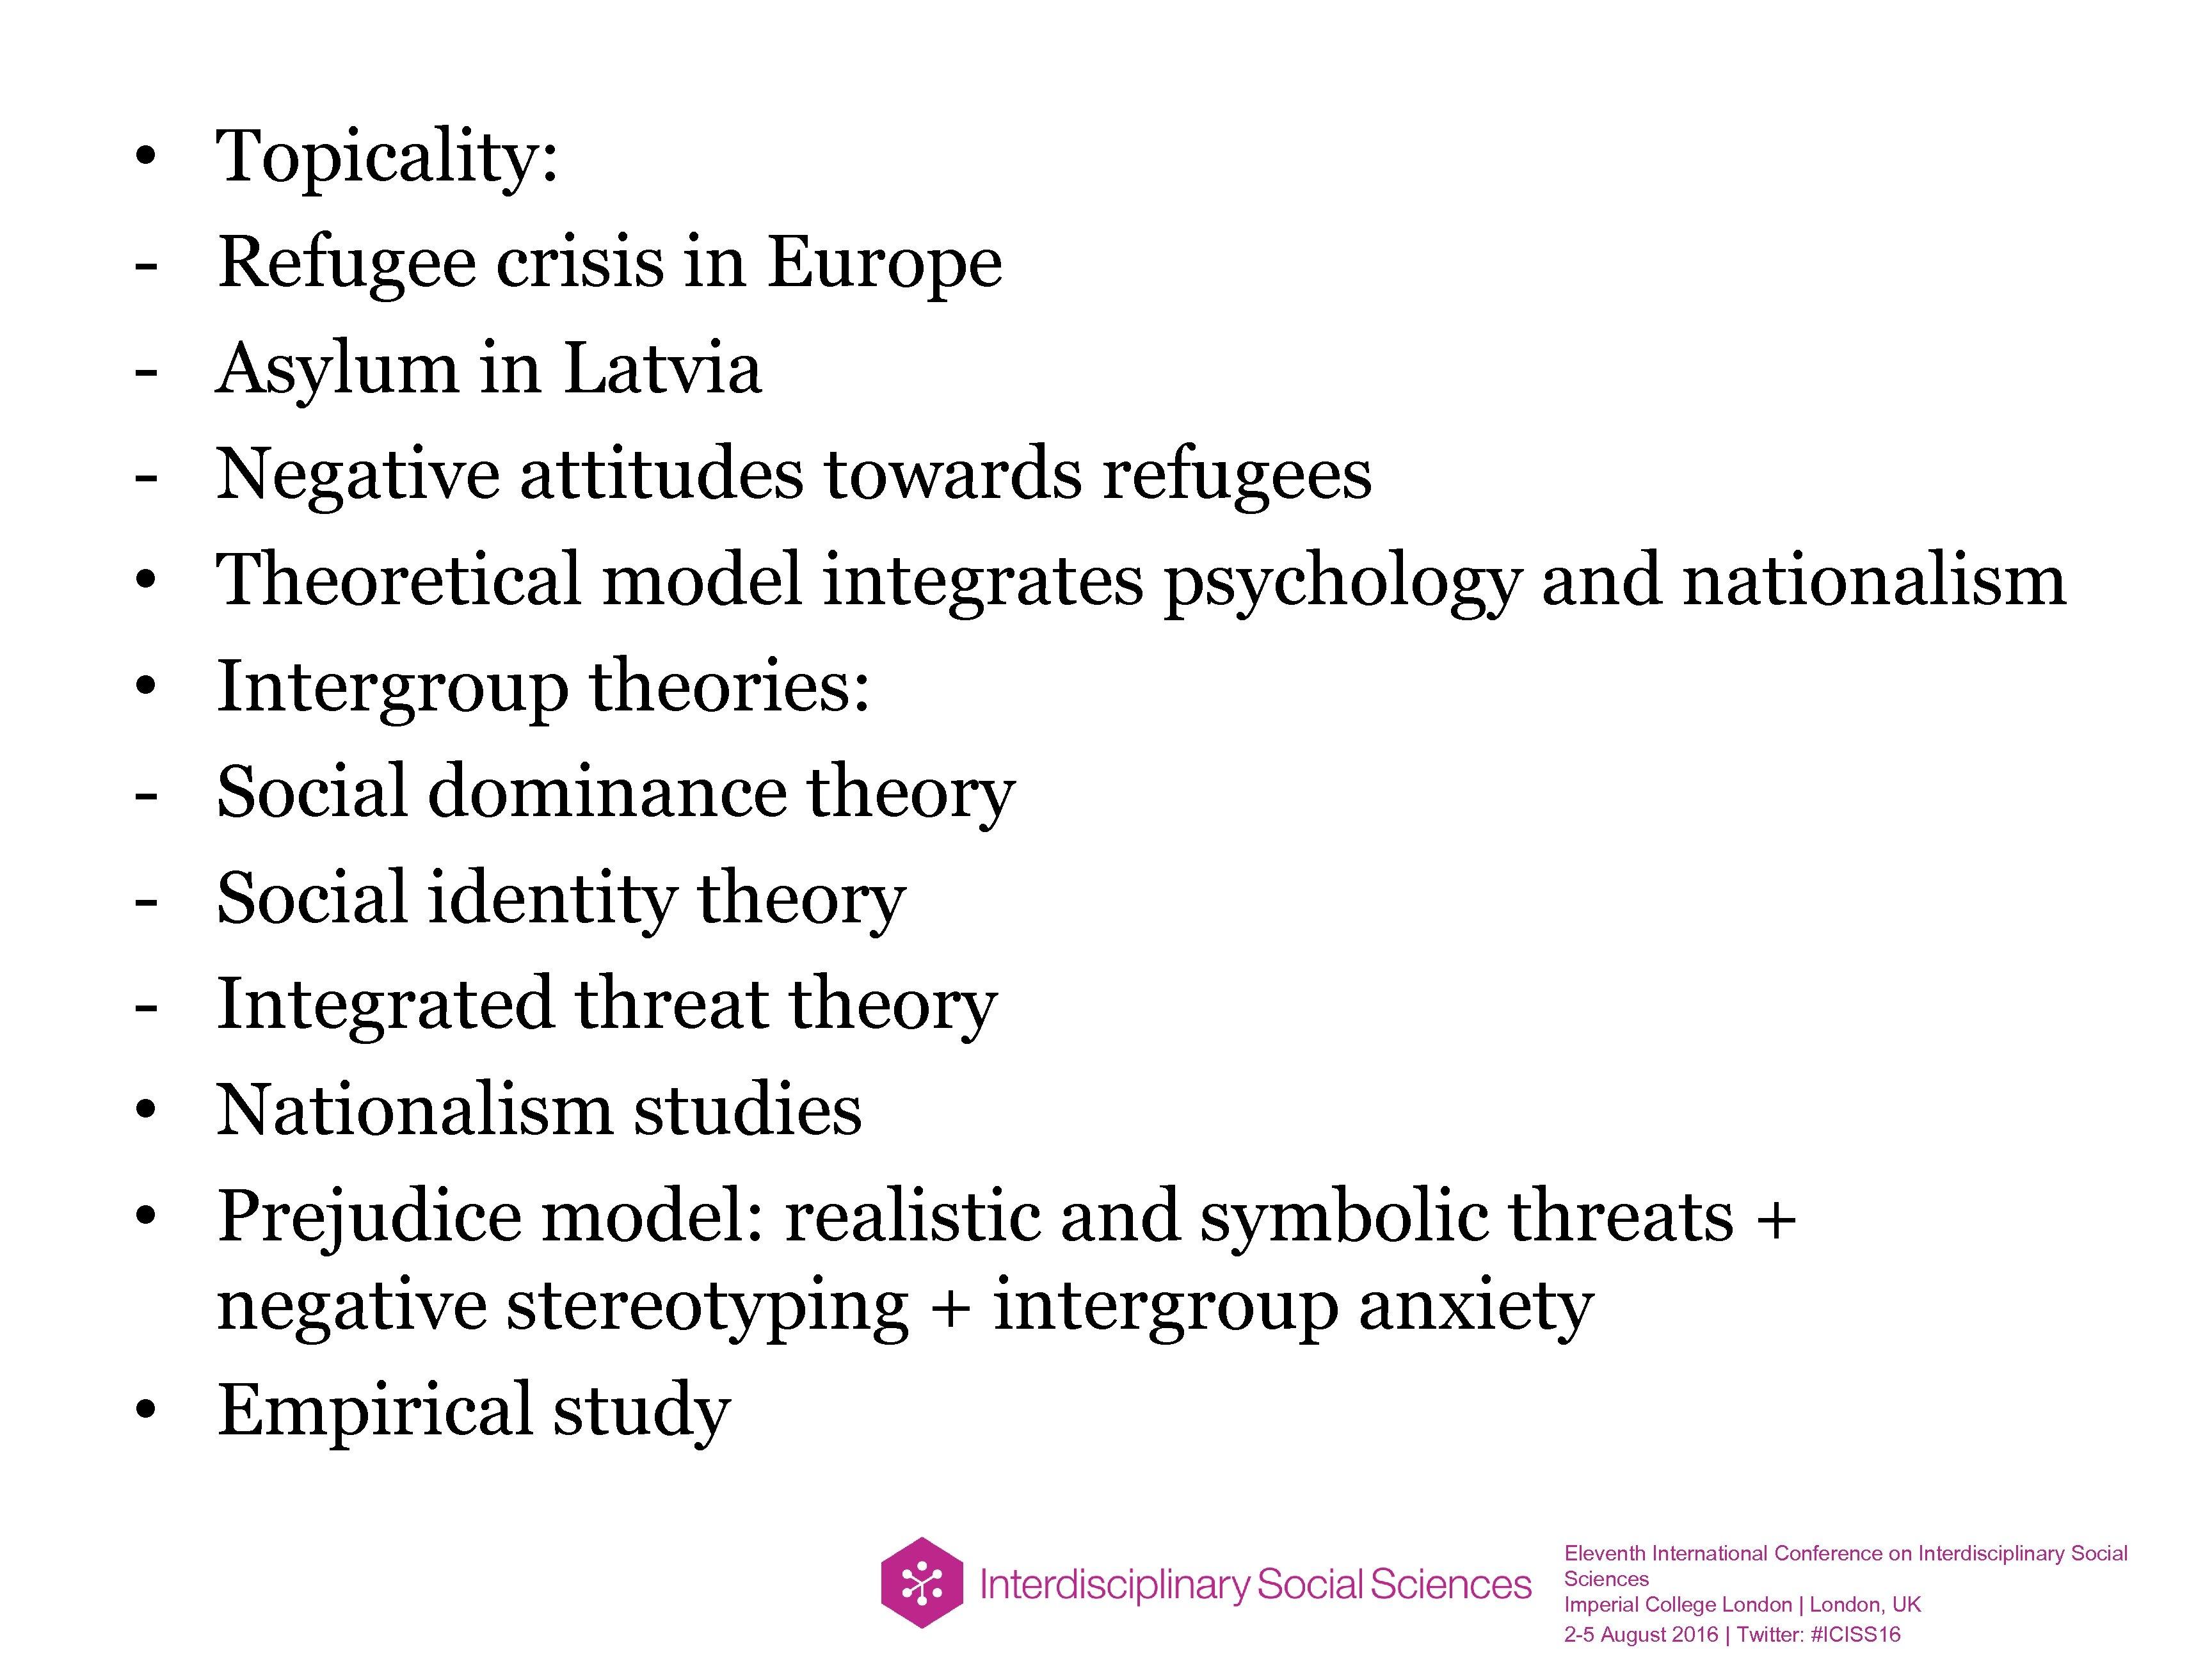 Topicality: Refugee crisis in Europe Asylum in Latvia Negative attitudes towards refugees Theoretical model